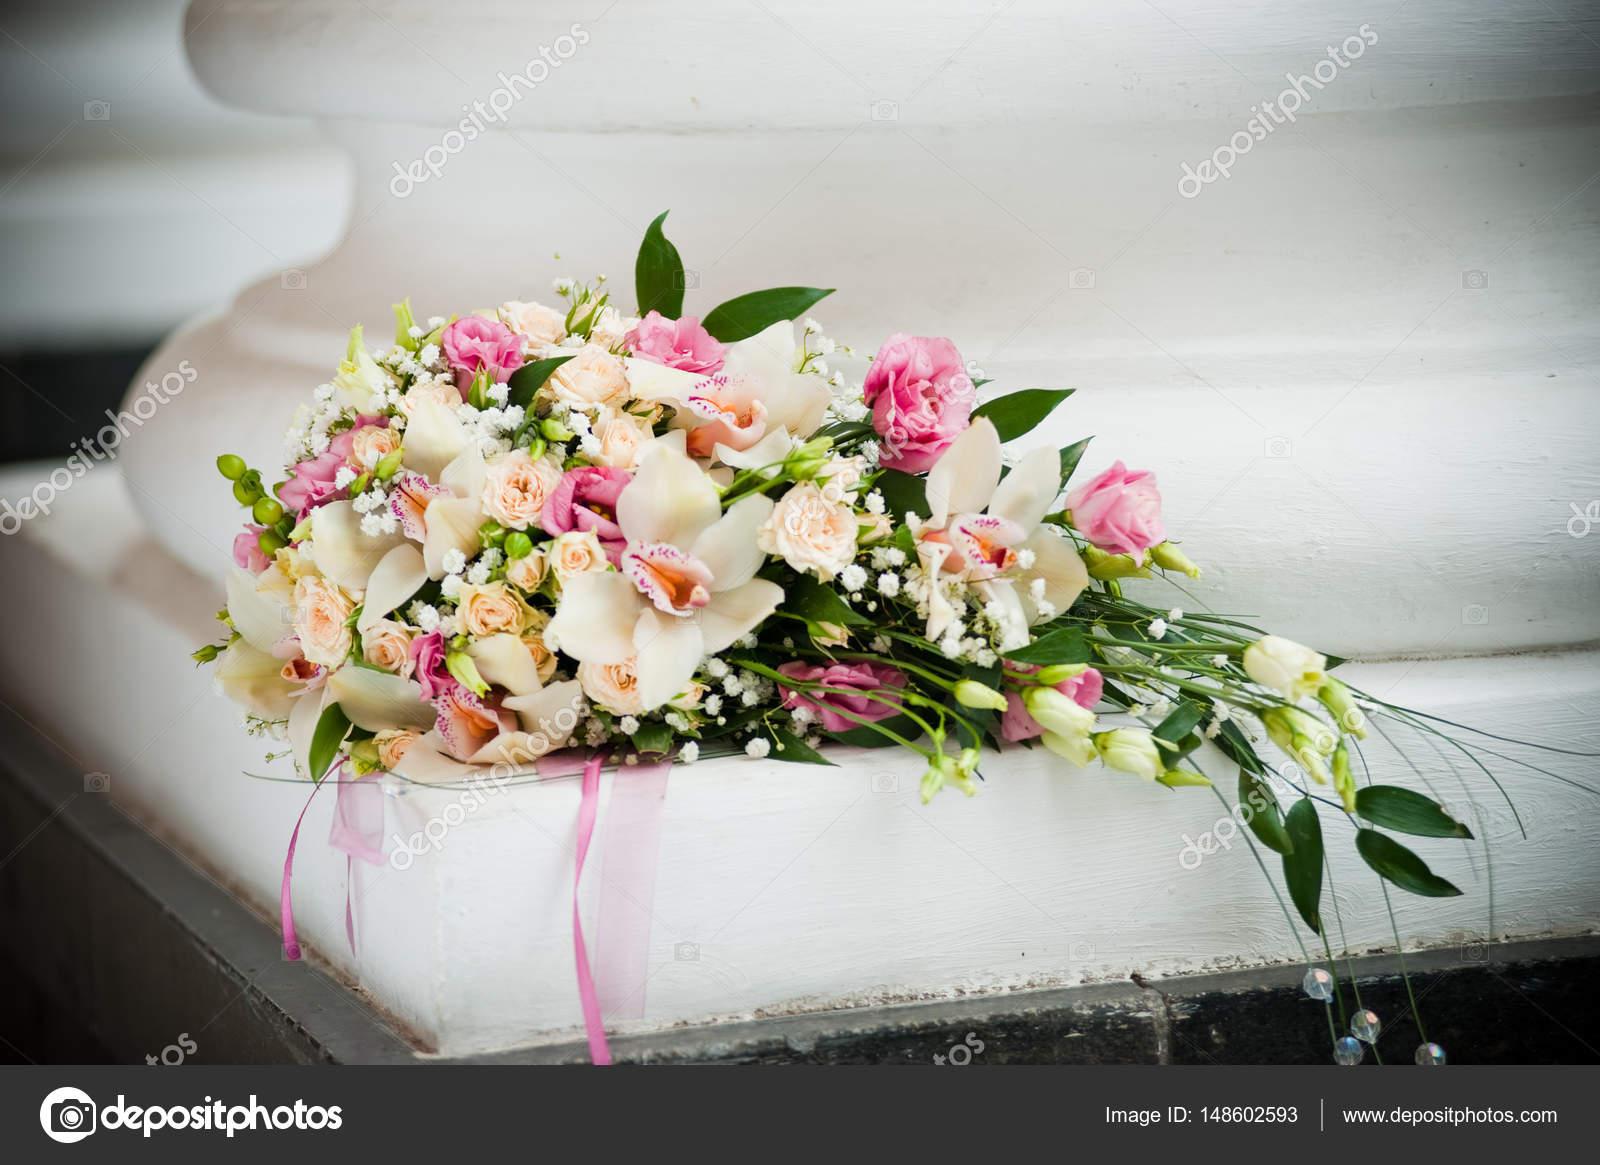 Wedding bouquet of different flowers stock photo white78 148602593 wedding bouquet of different flowers stock photo izmirmasajfo Gallery